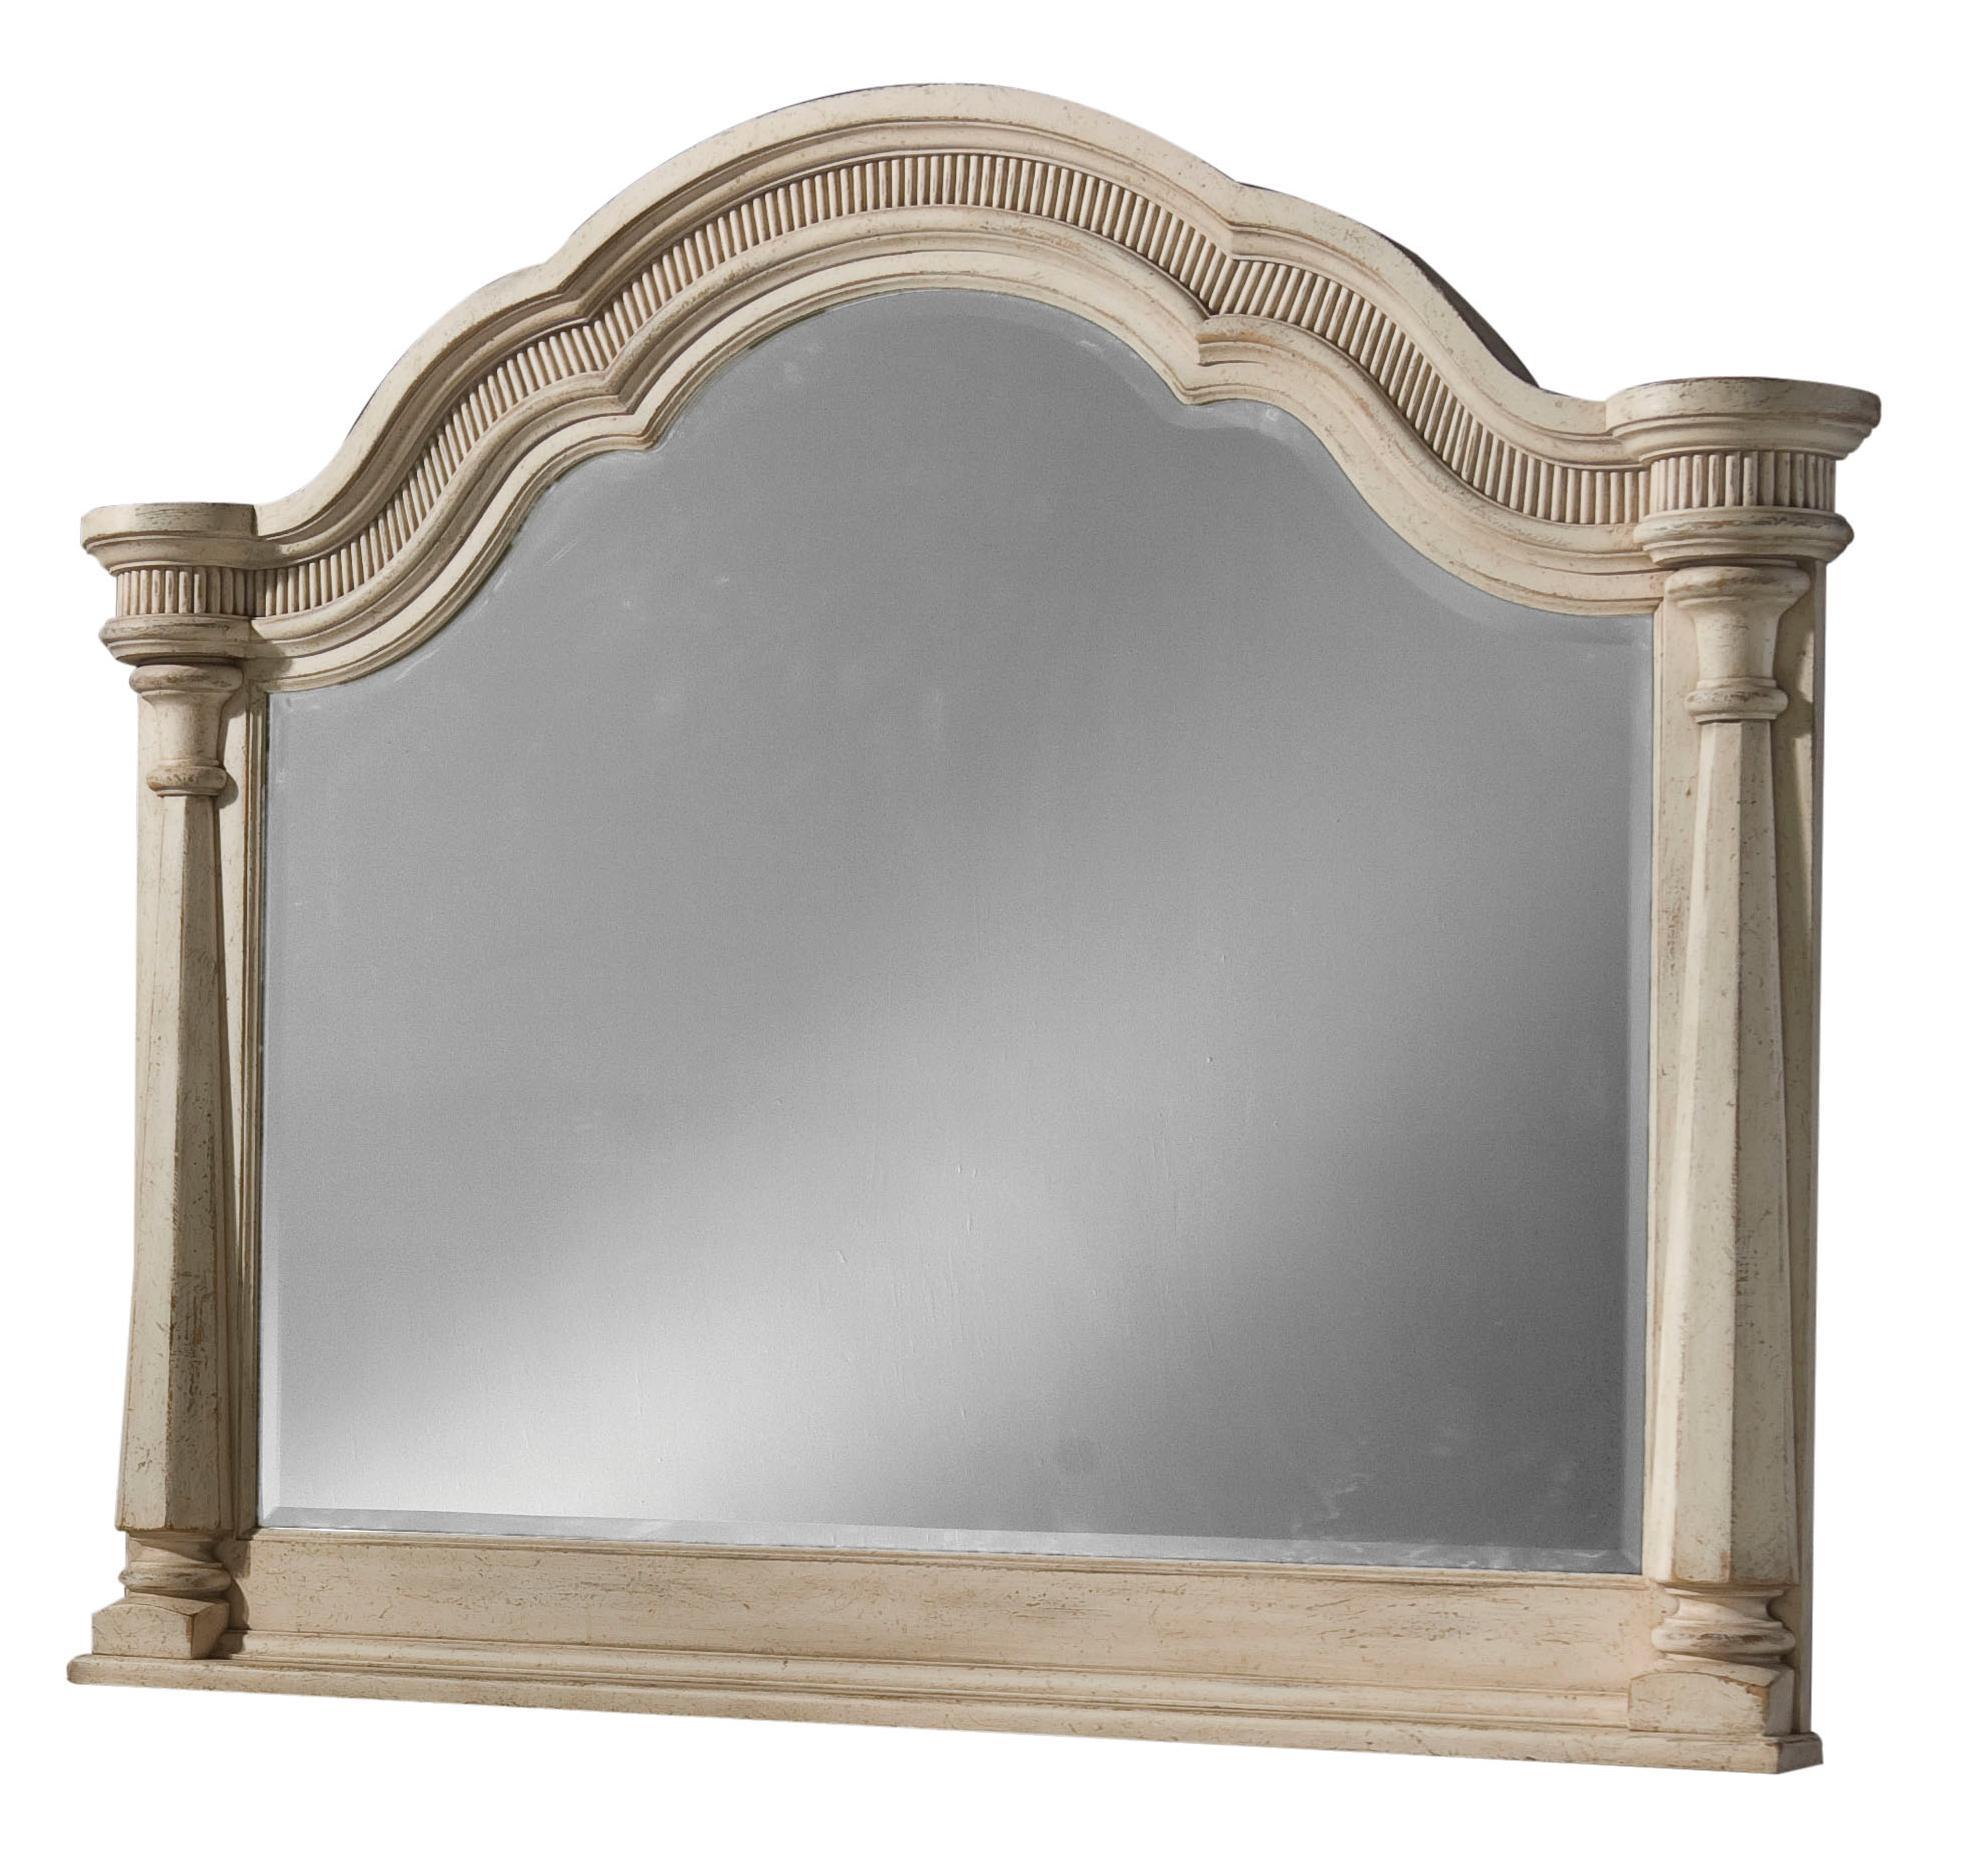 Belfort Signature Farrington Starter Mirror - Item Number: 189120-2617